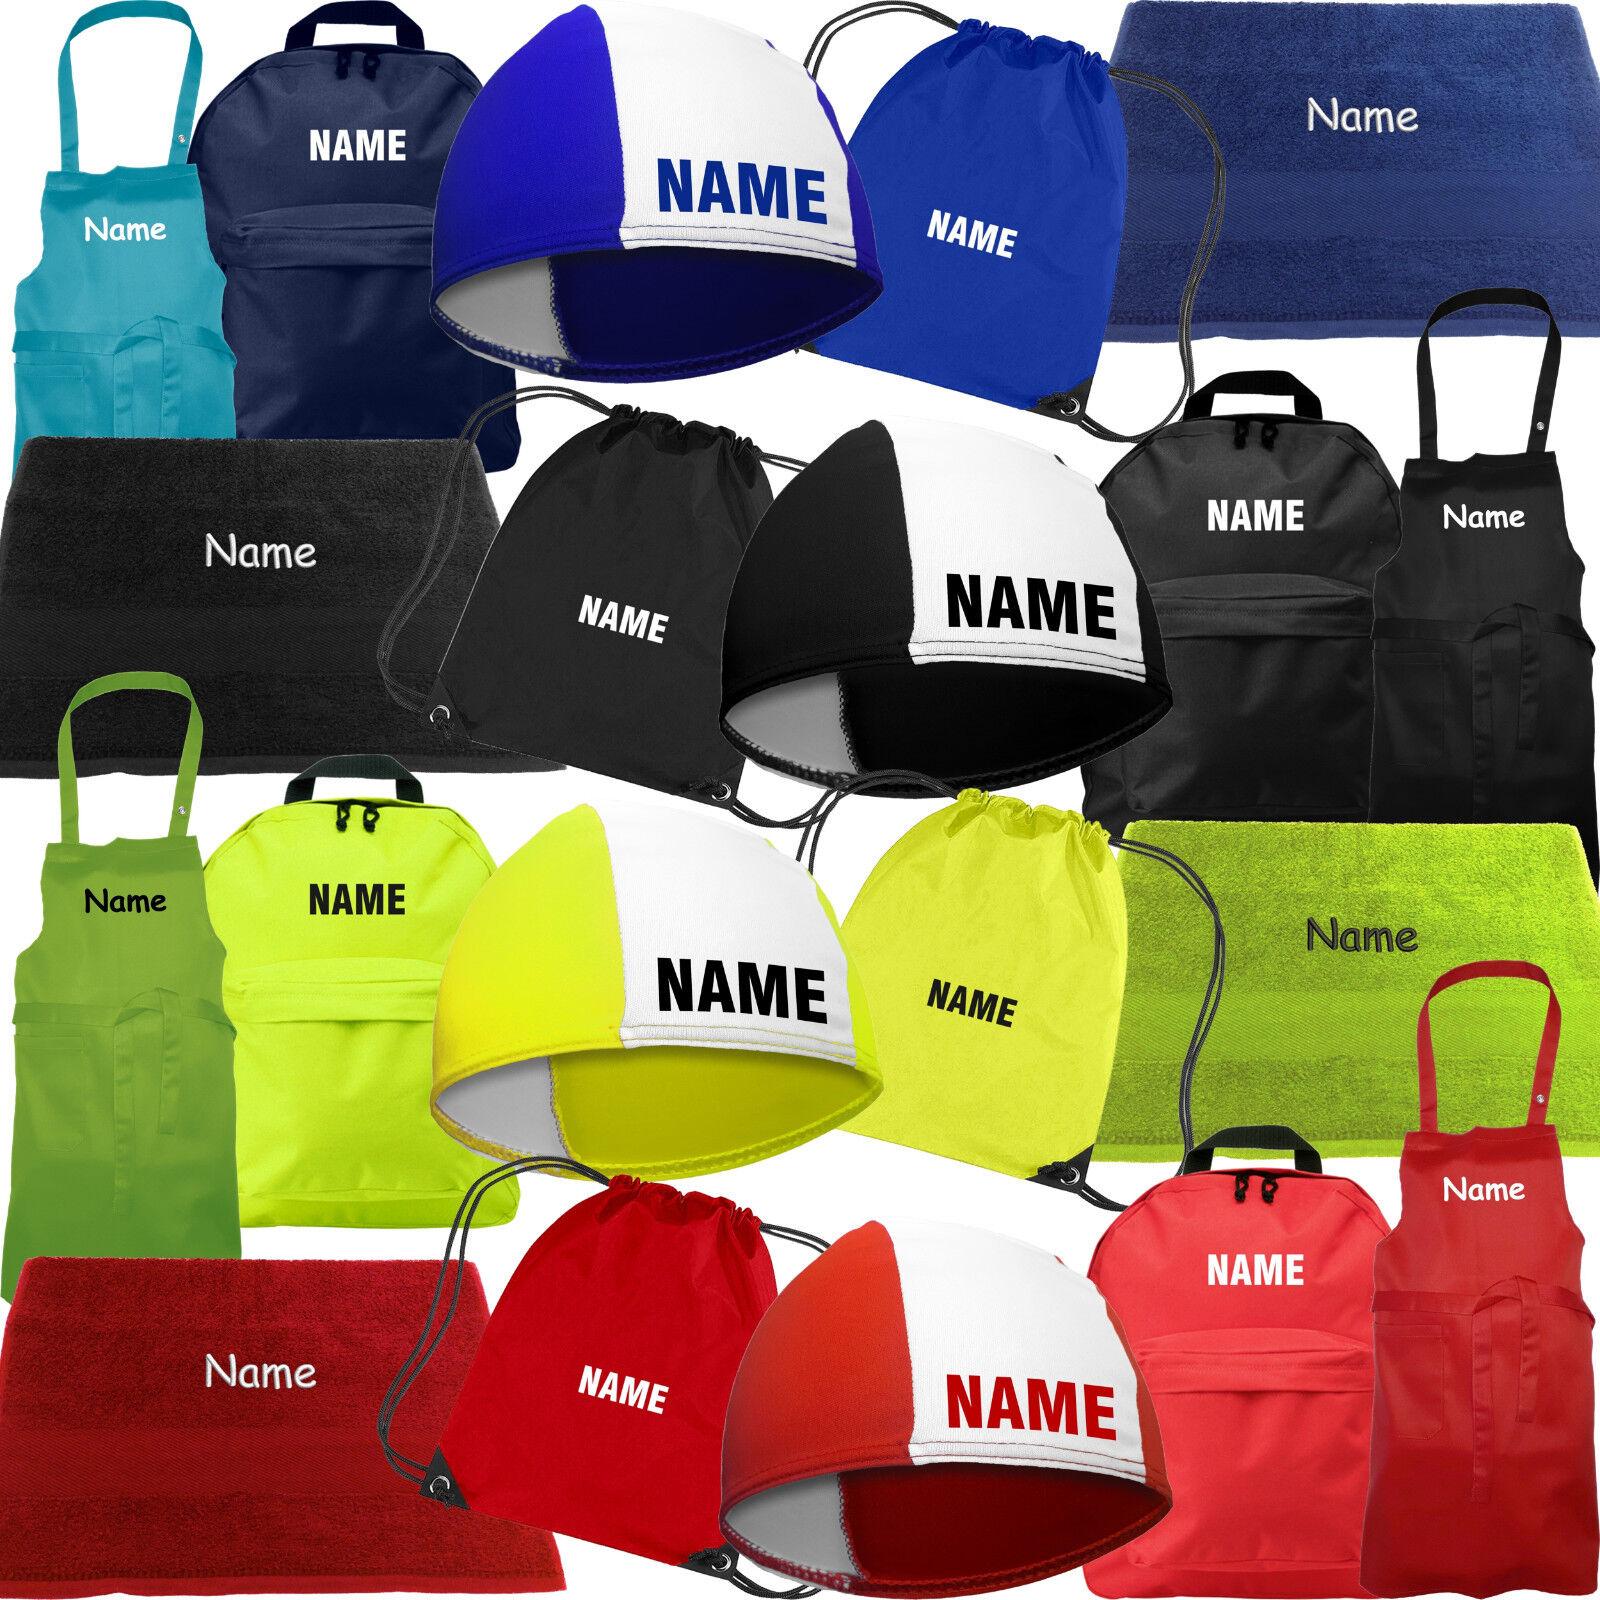 Fashy Badekappe Handtuch Rucksack Schürze mit Namen zum Schulanfang Einschulung